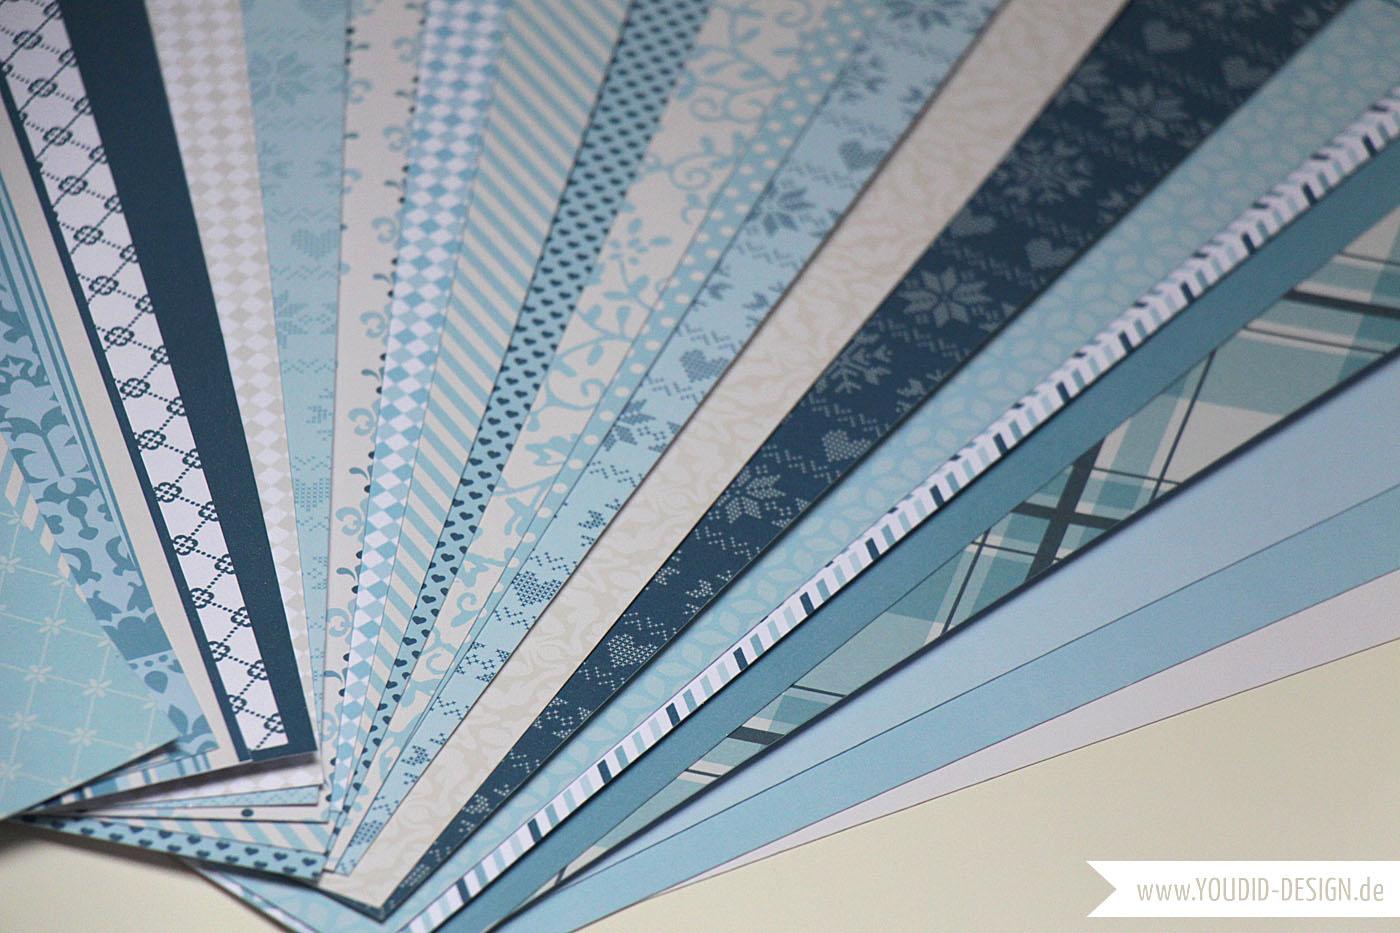 Scrapbooking Paper Freebie| www.youdid-design.de